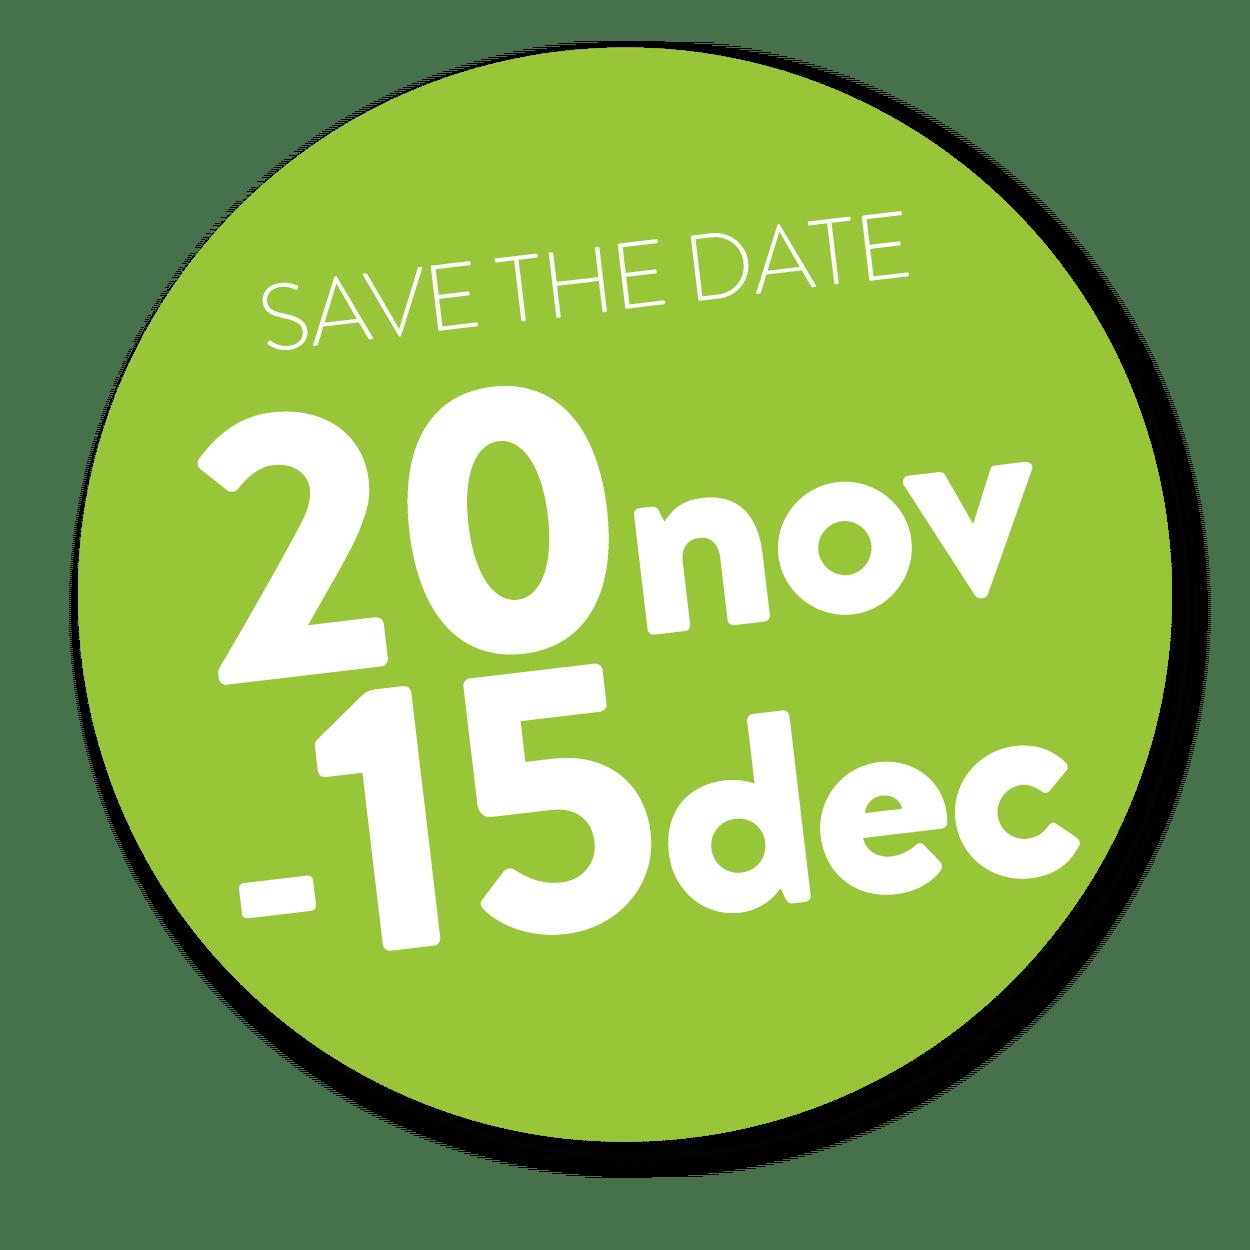 save the date 20nov-15 dec